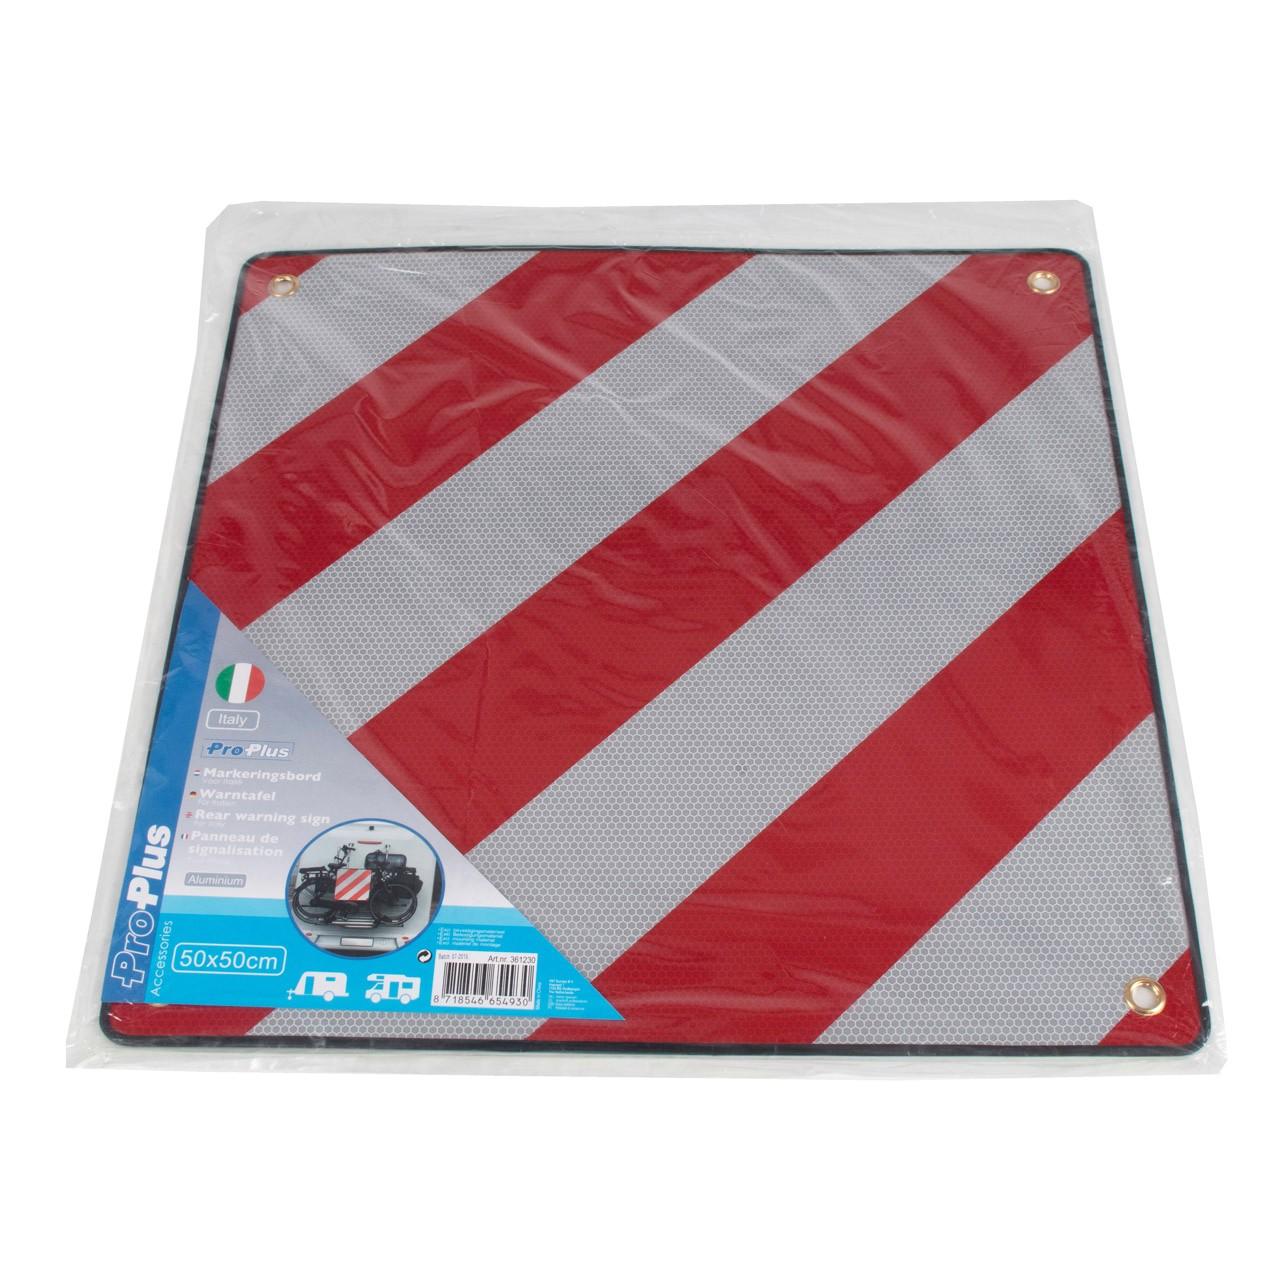 PROPLUS 361230 Warnschild Aluminium Alu-Warntafel 50x50cm für Italien